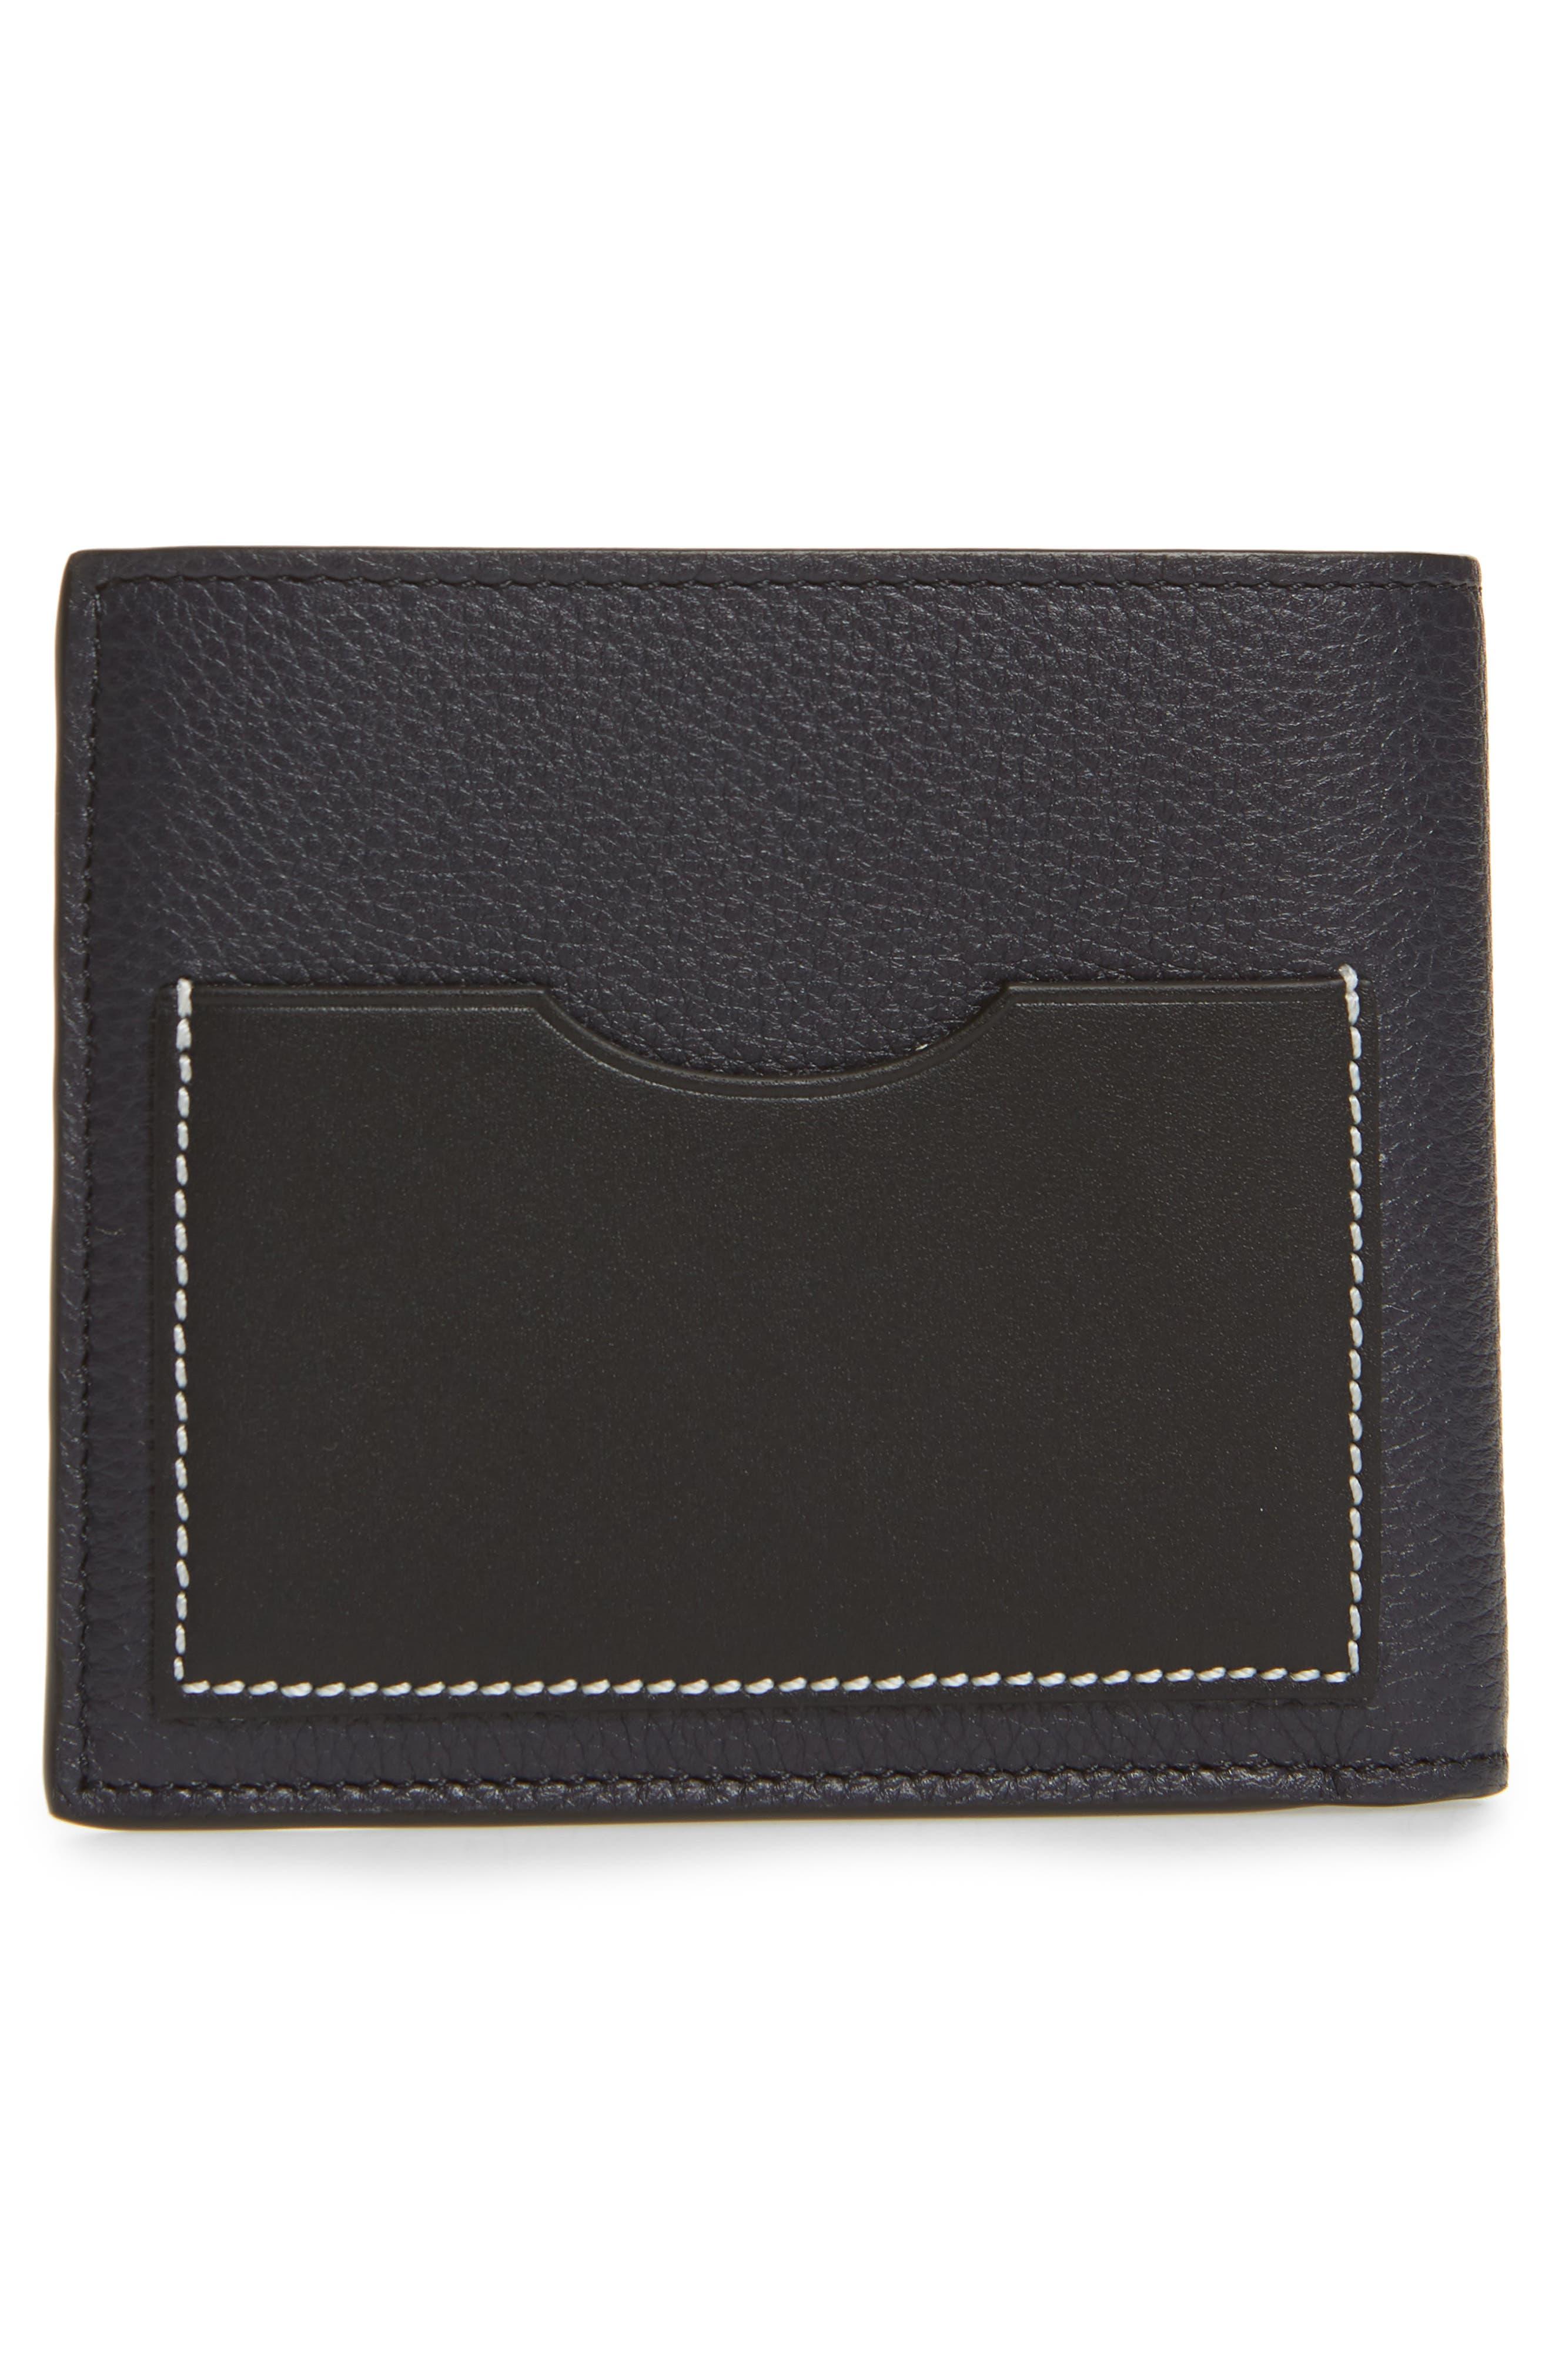 LOEWE,                             Calfskin Leather Bifold Wallet,                             Alternate thumbnail 3, color,                             MIDNIGHT